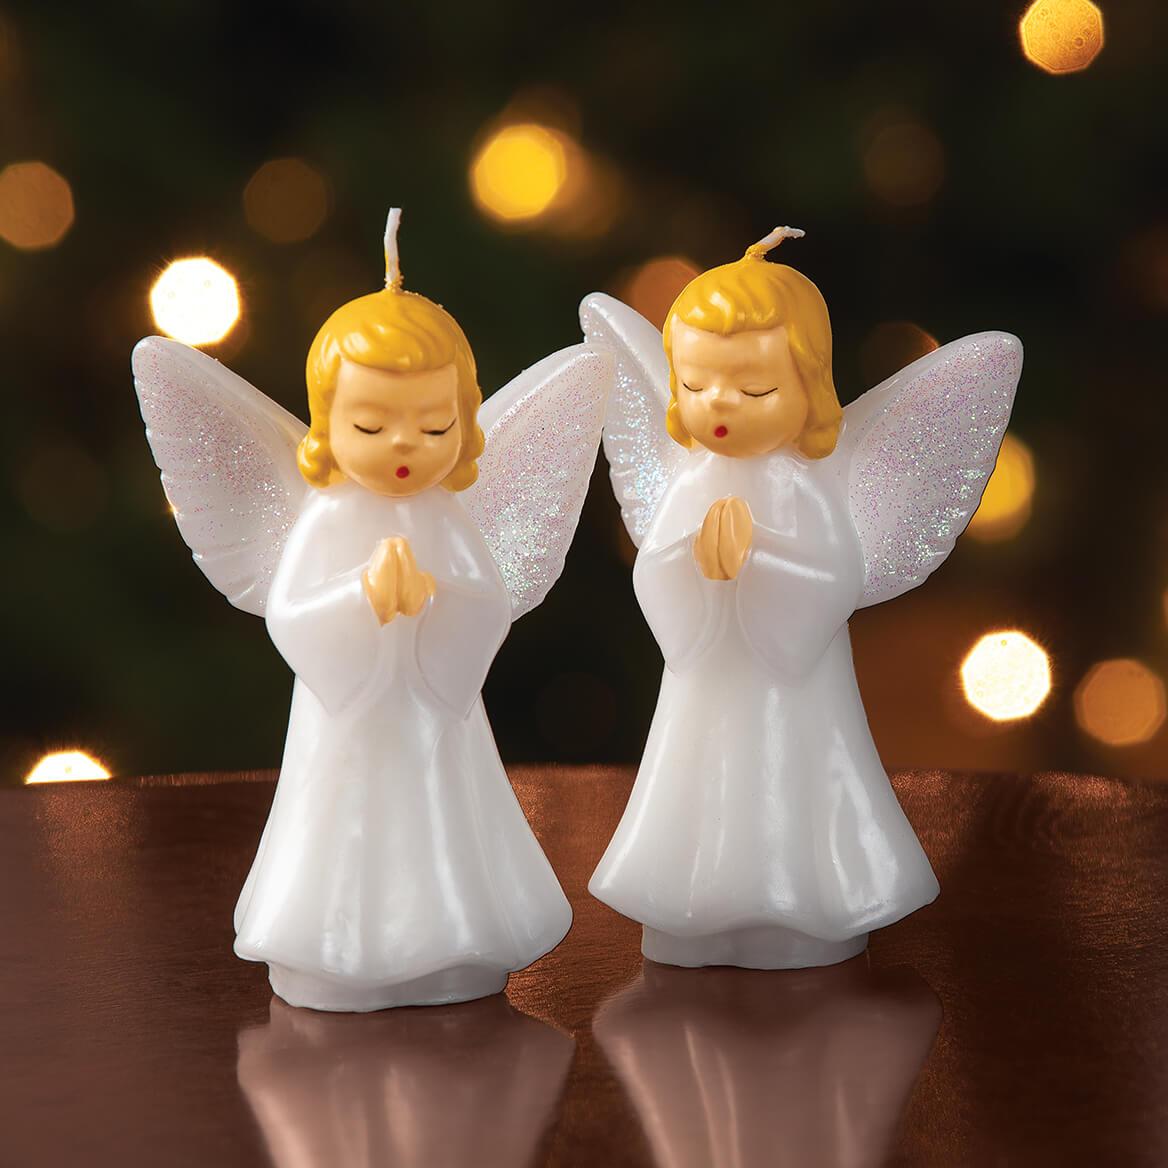 Vintage Praying Angels Candle Pair-370731